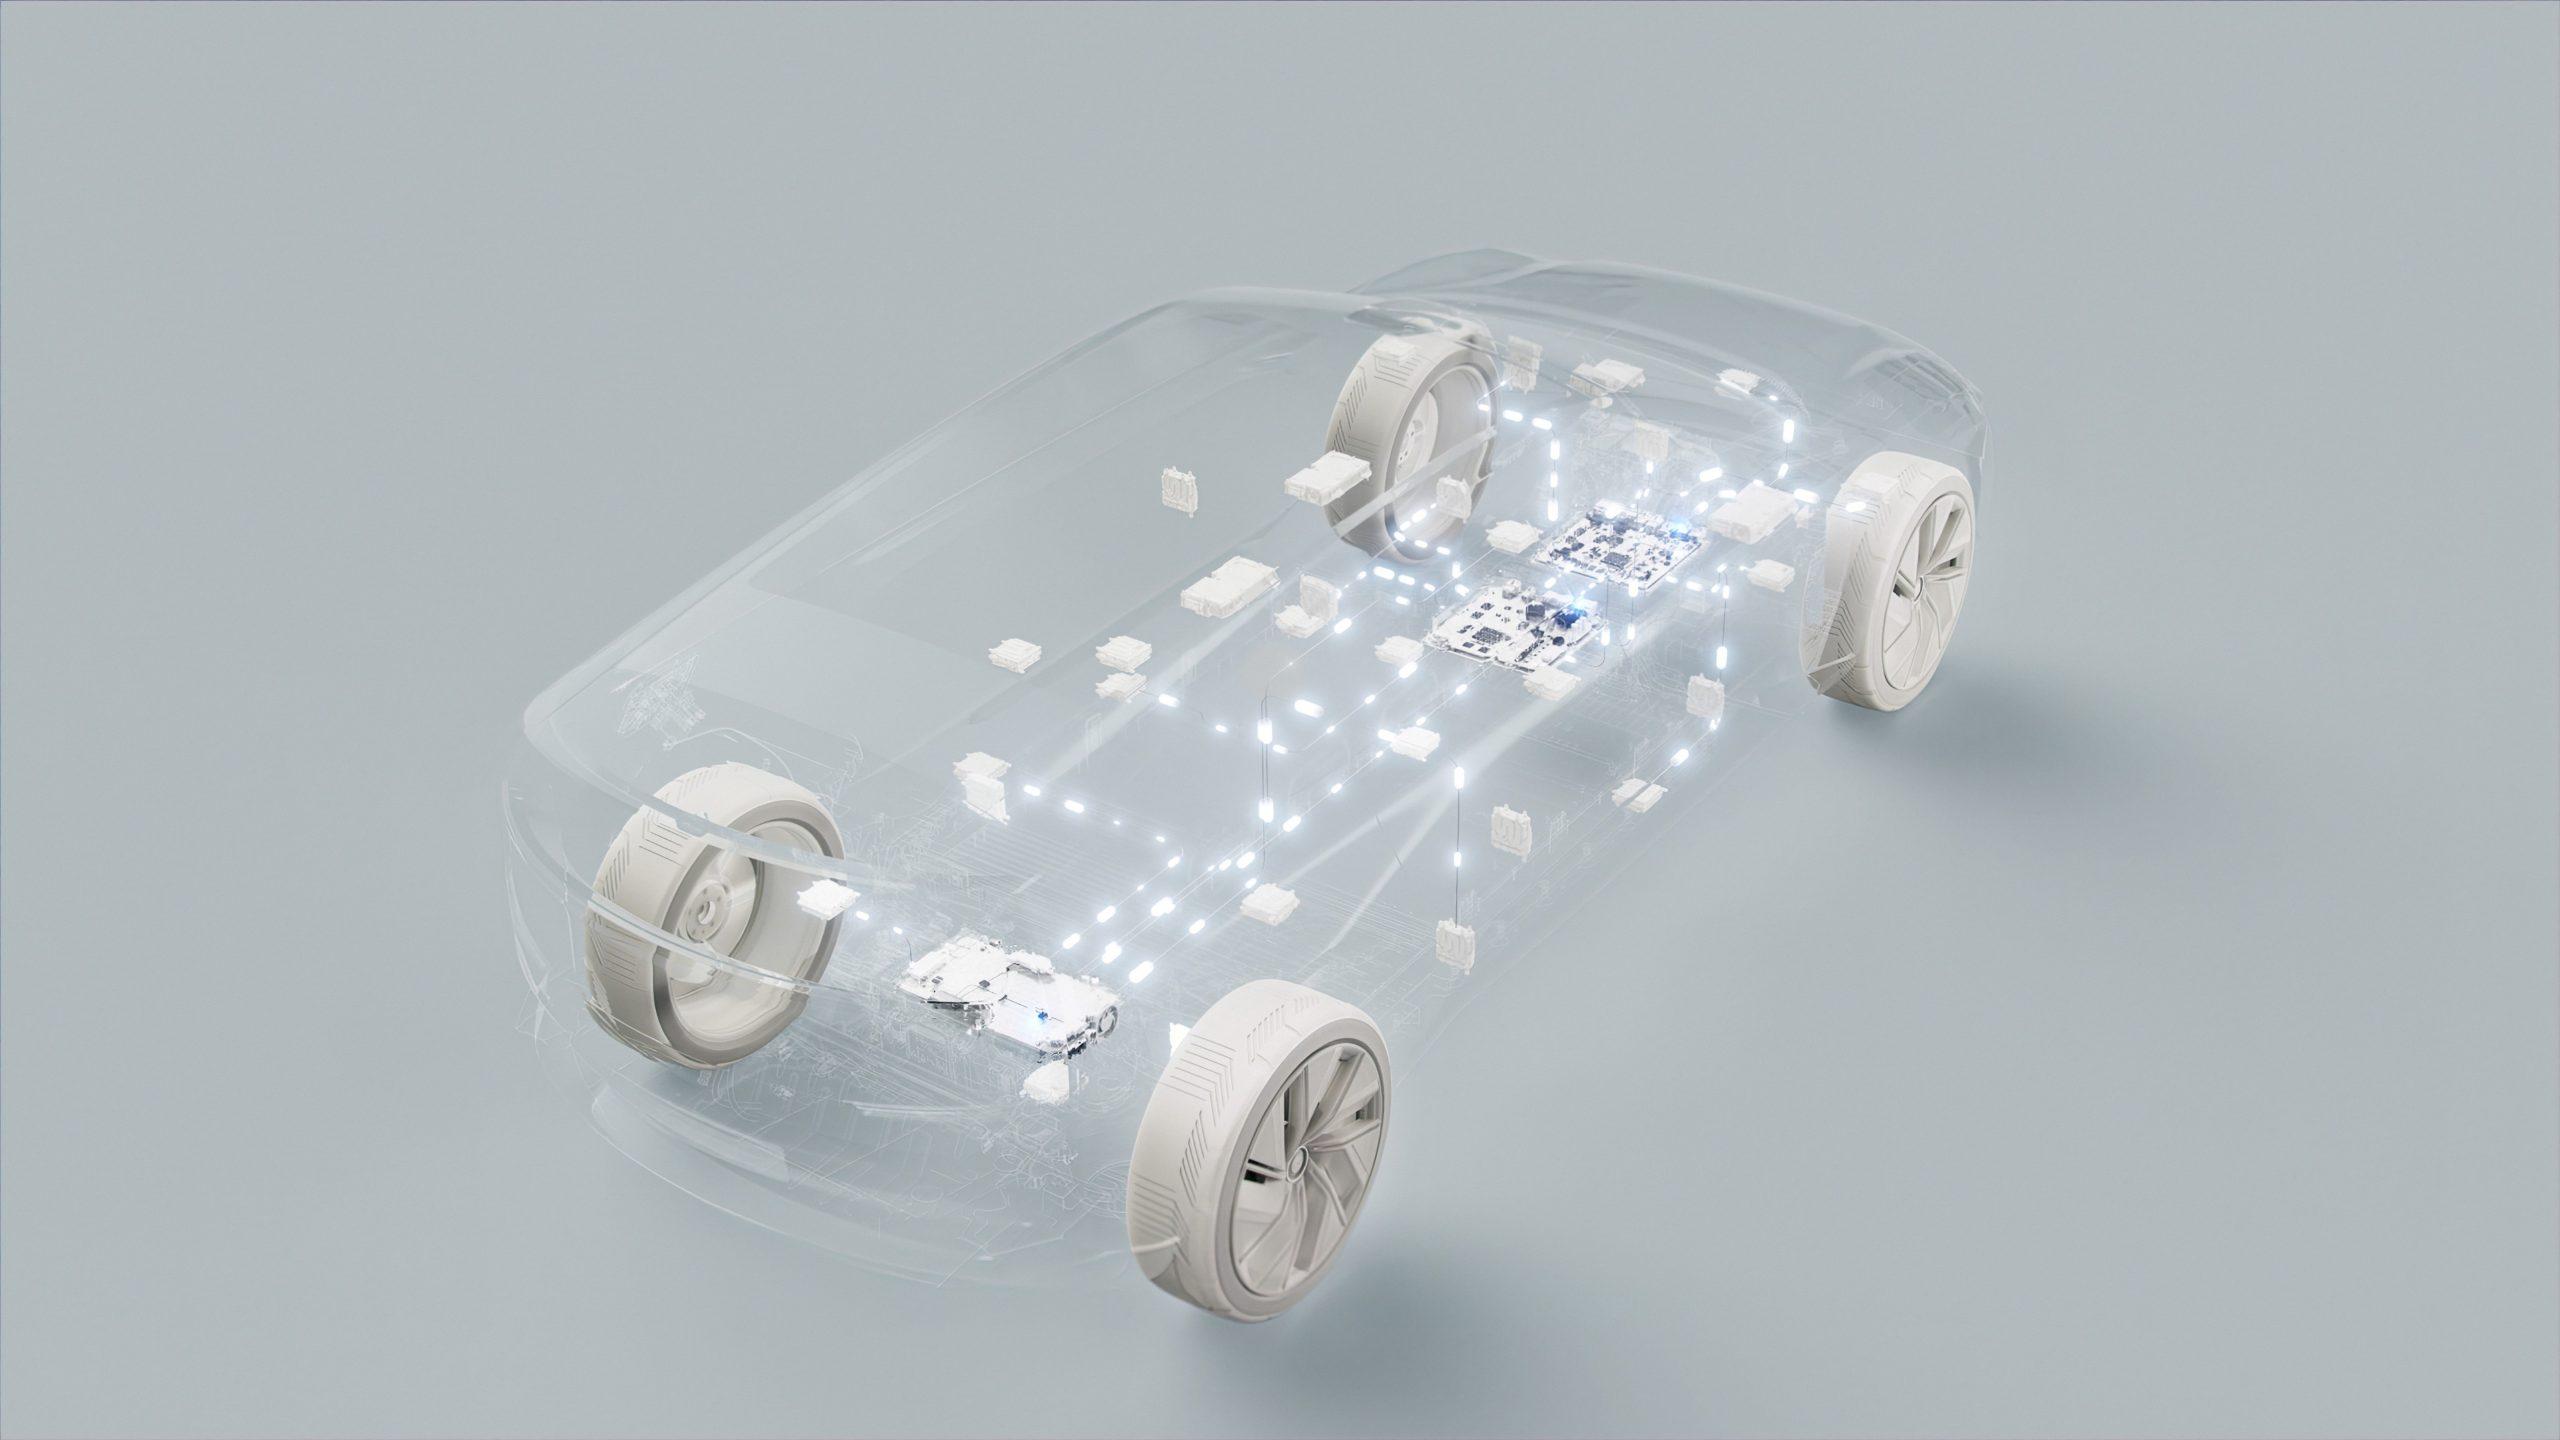 283670 Tech Moment Core computing scaled Η Volvo θα αναπτύσσει δικά της λογισμικά!